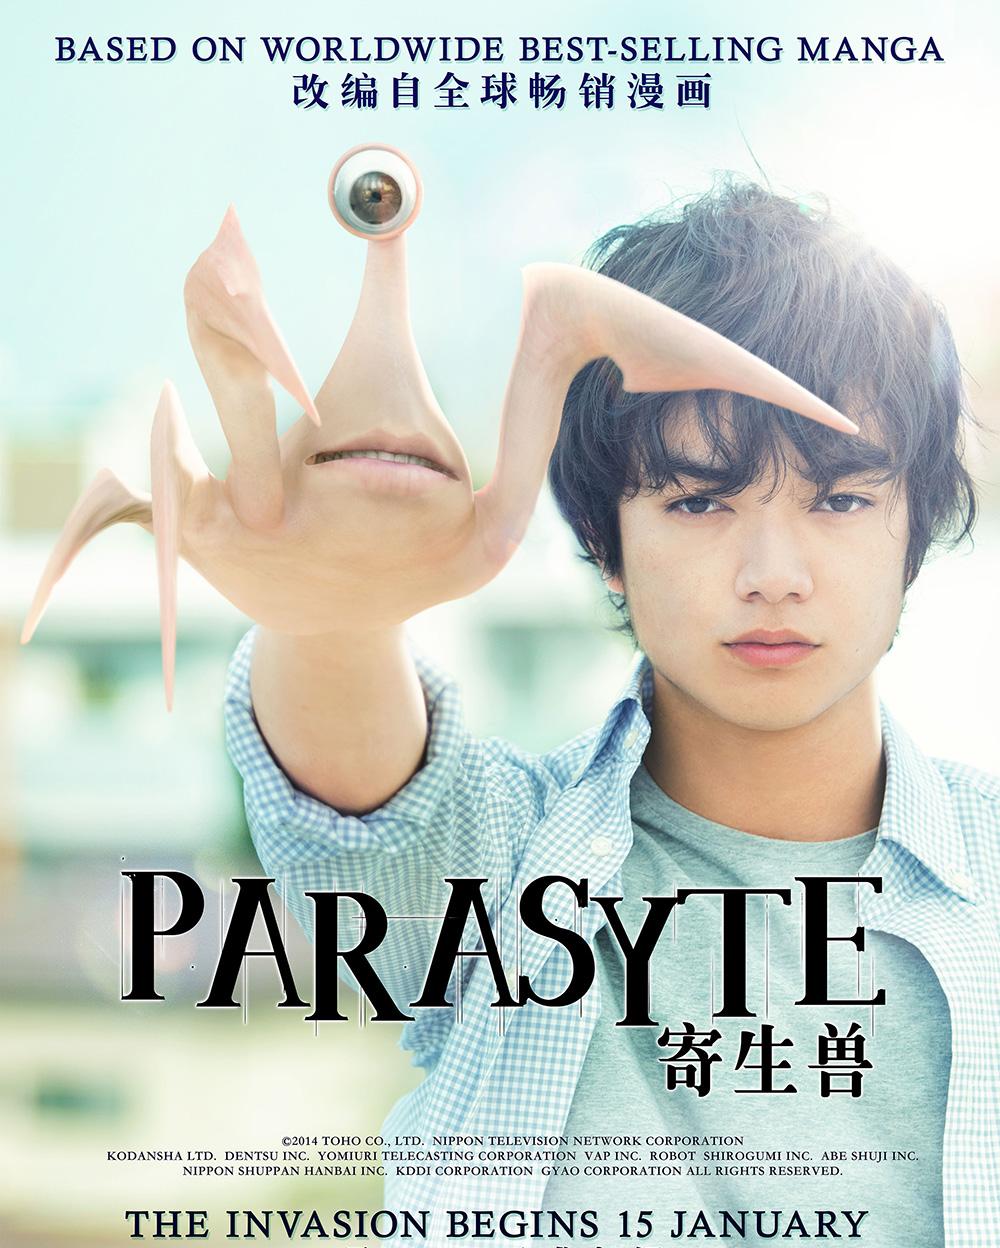 parasyte-poster-otaku-house